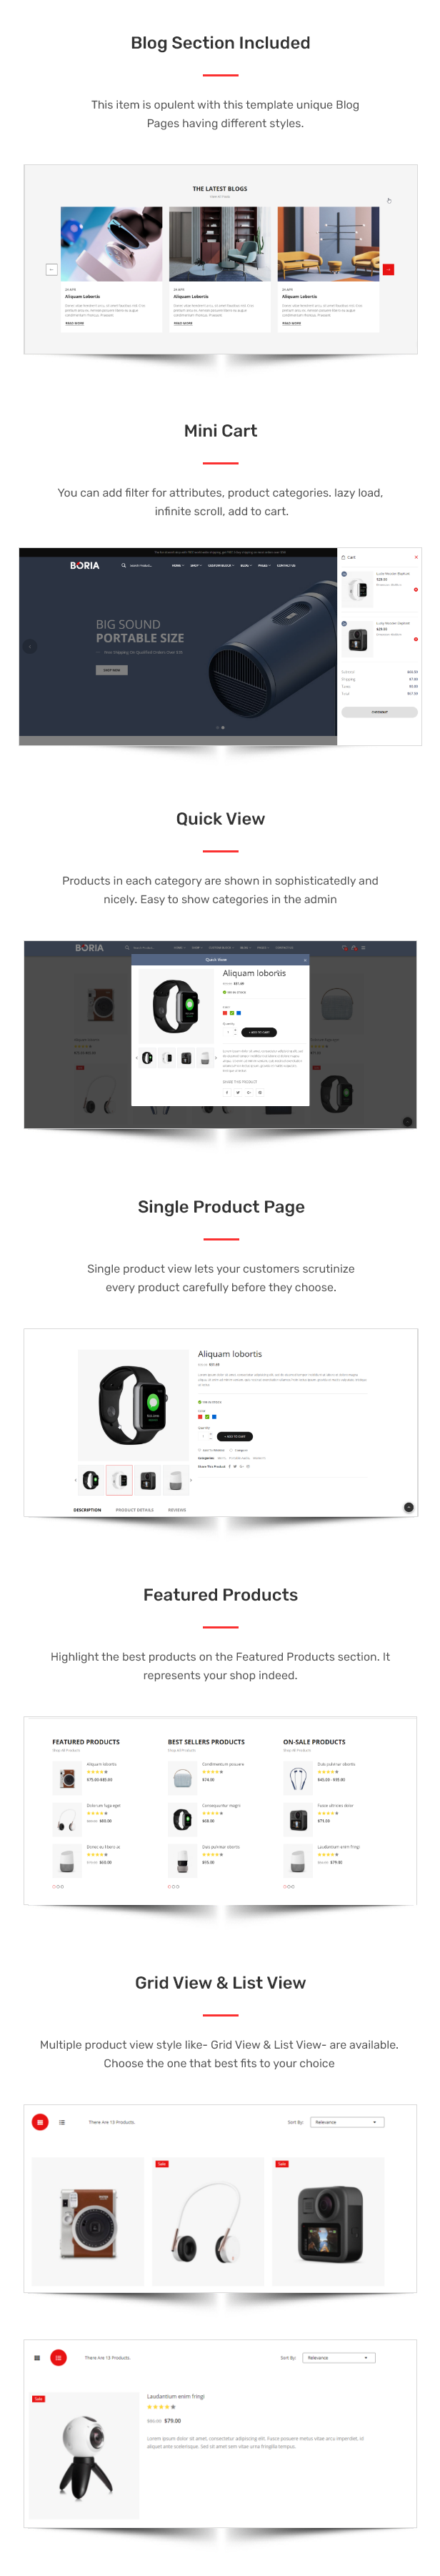 Boria - Multipurpose Responsive eCommerce HTML Template - 2